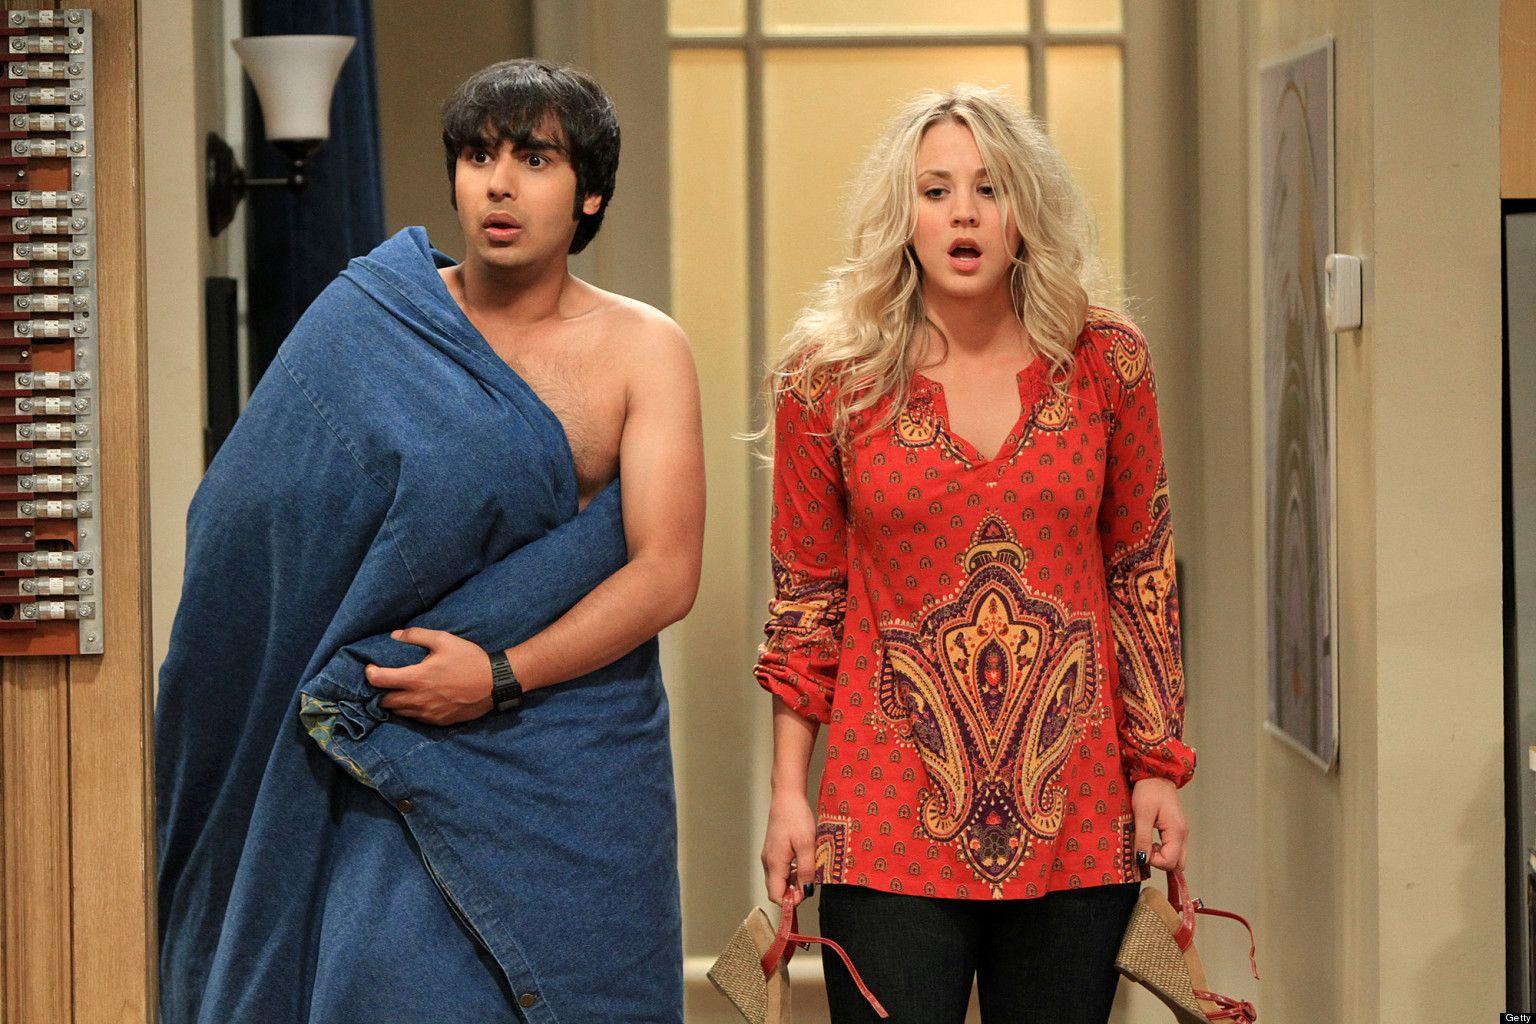 Kaley Cuoco-Sweeting as Penny and Kunal Nayyar as Raj Koothrappali.